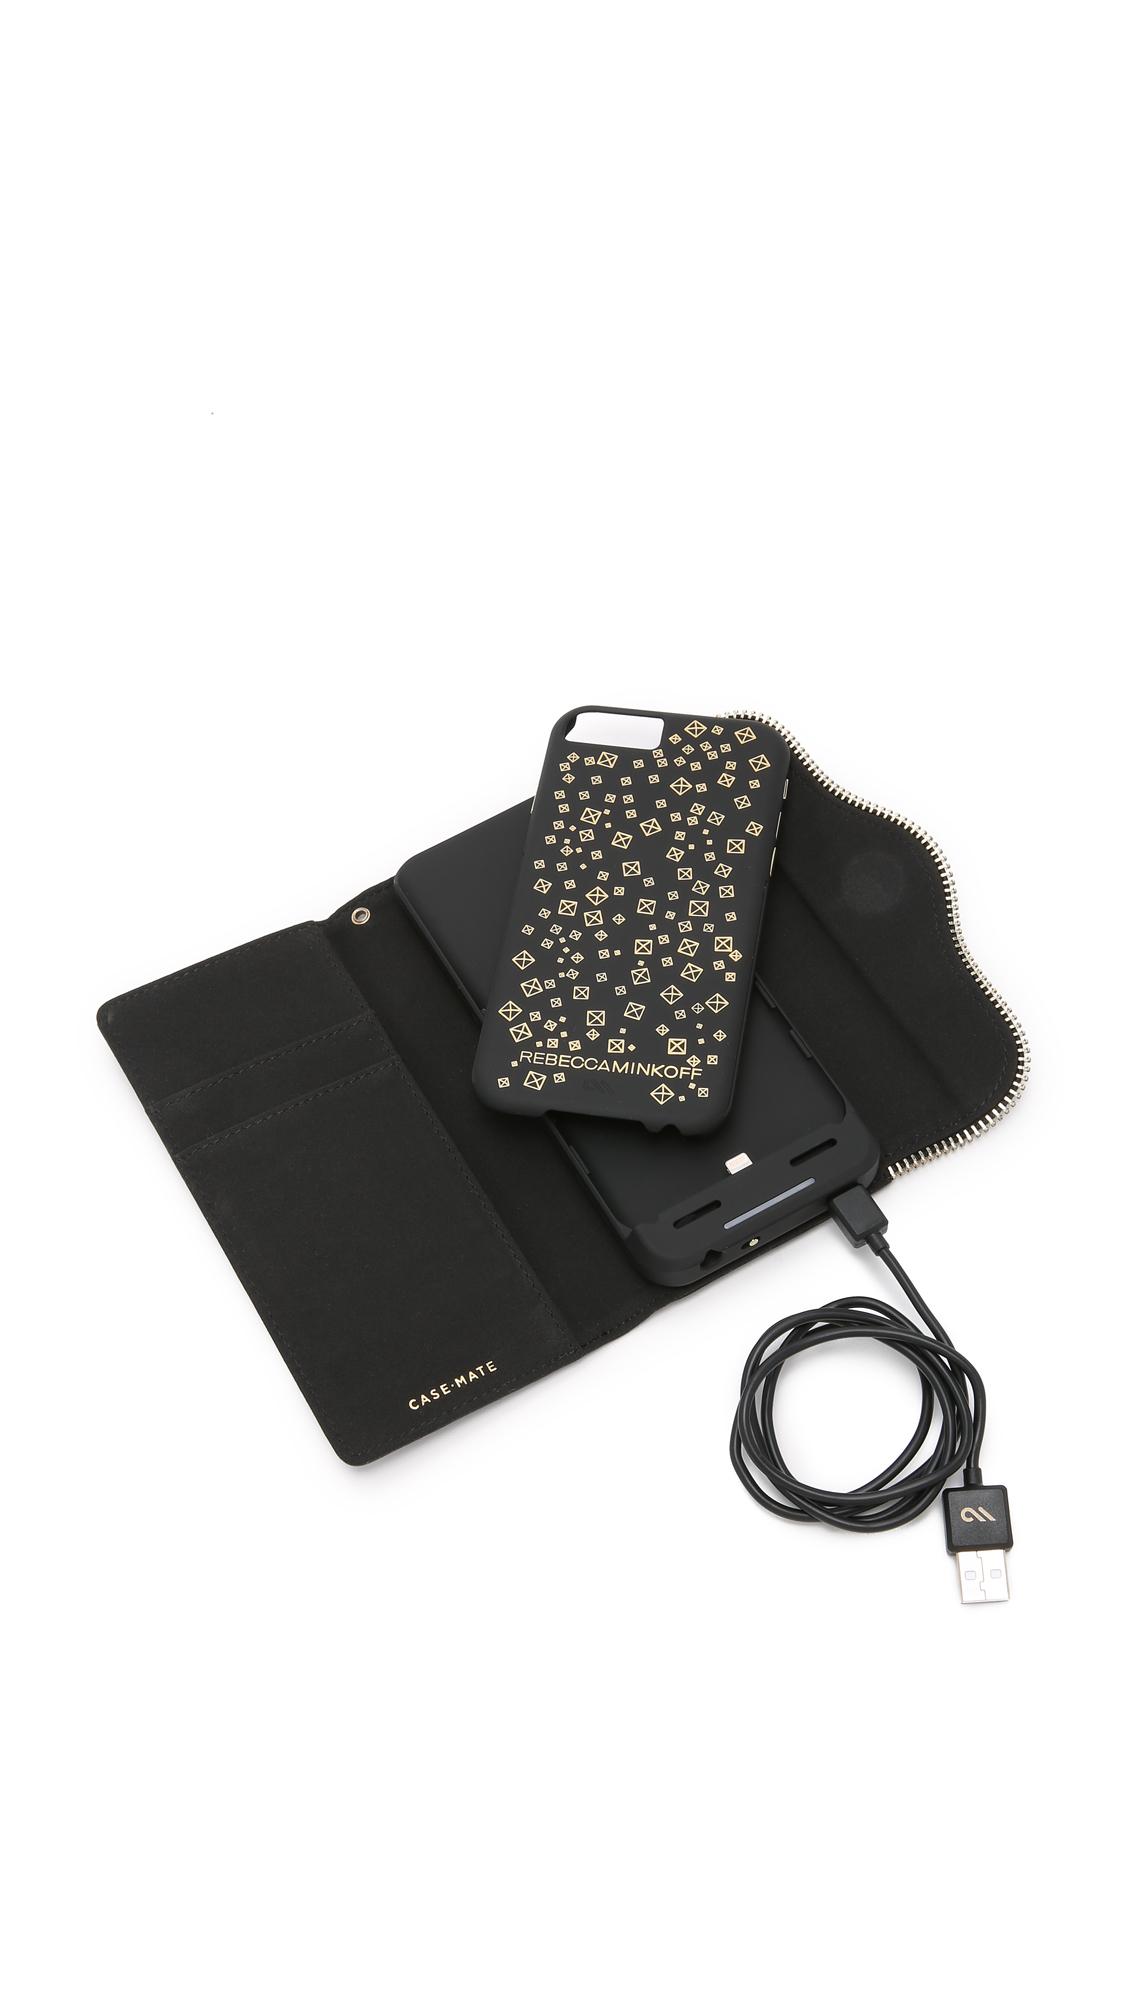 Charging Wristlet Iphone